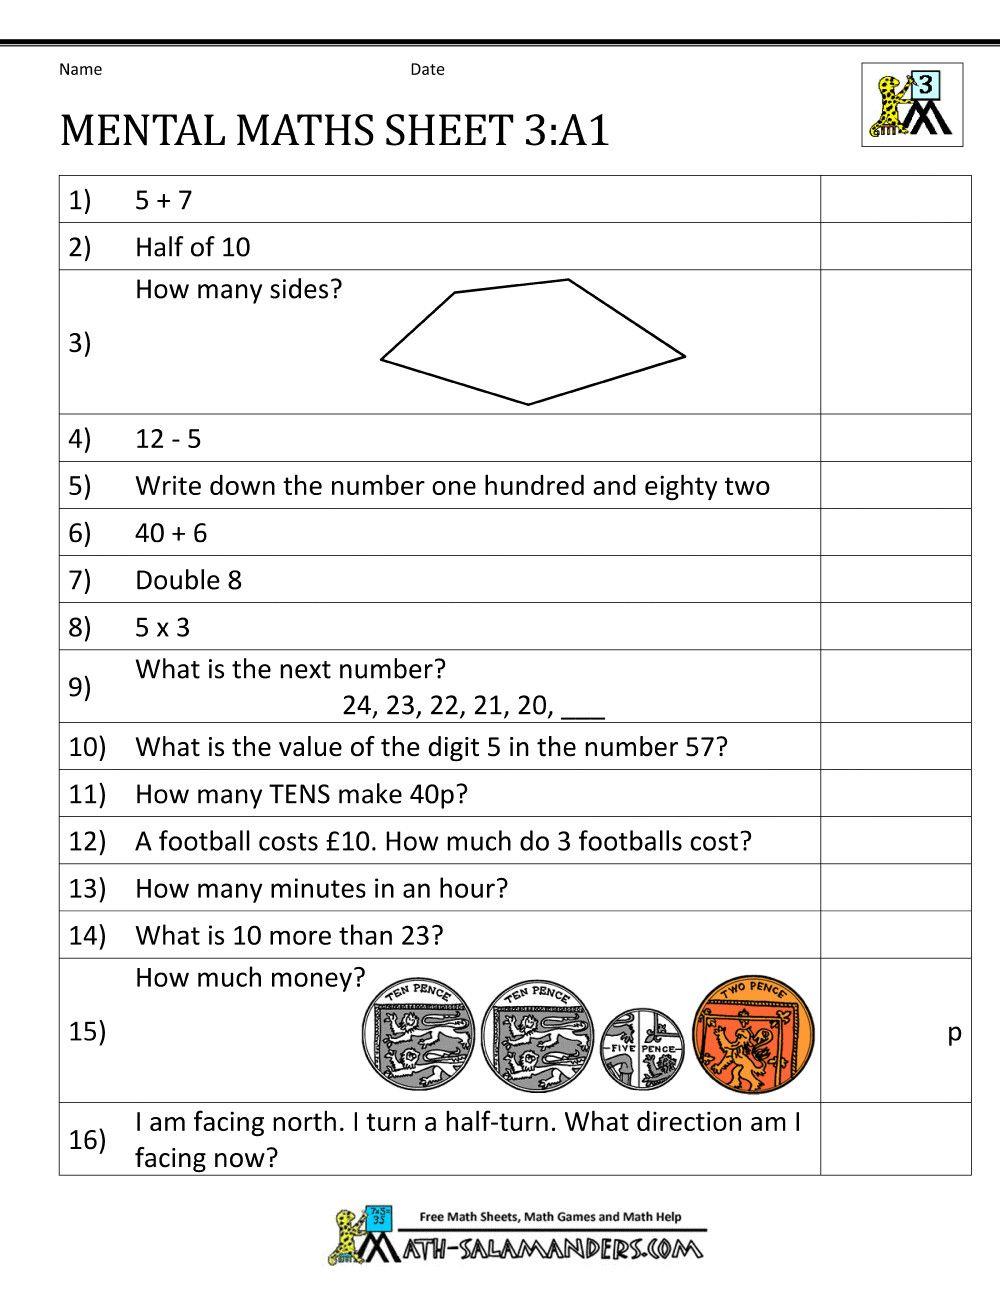 4 Year 3 Maths Worksheets In 2020 Mental Maths Worksheets Mental Math Free Math Worksheets